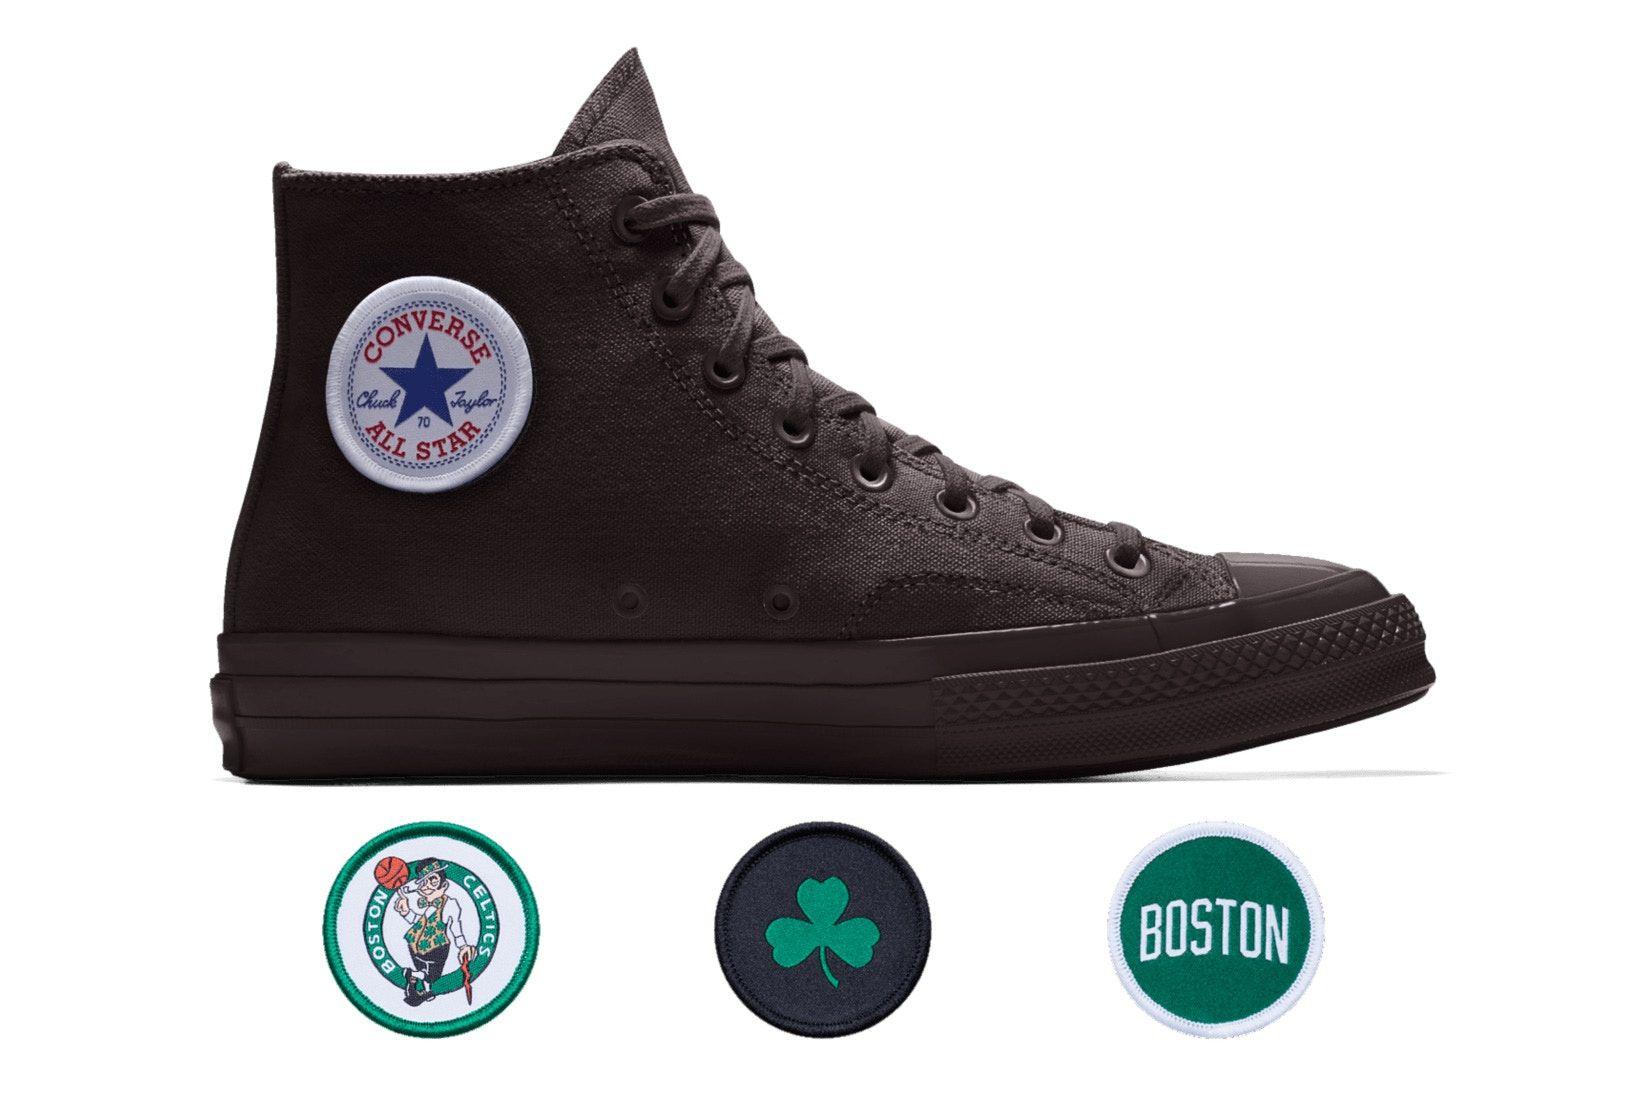 Converse's Custom Chuck 70 NBA High Joins the Playoff Race